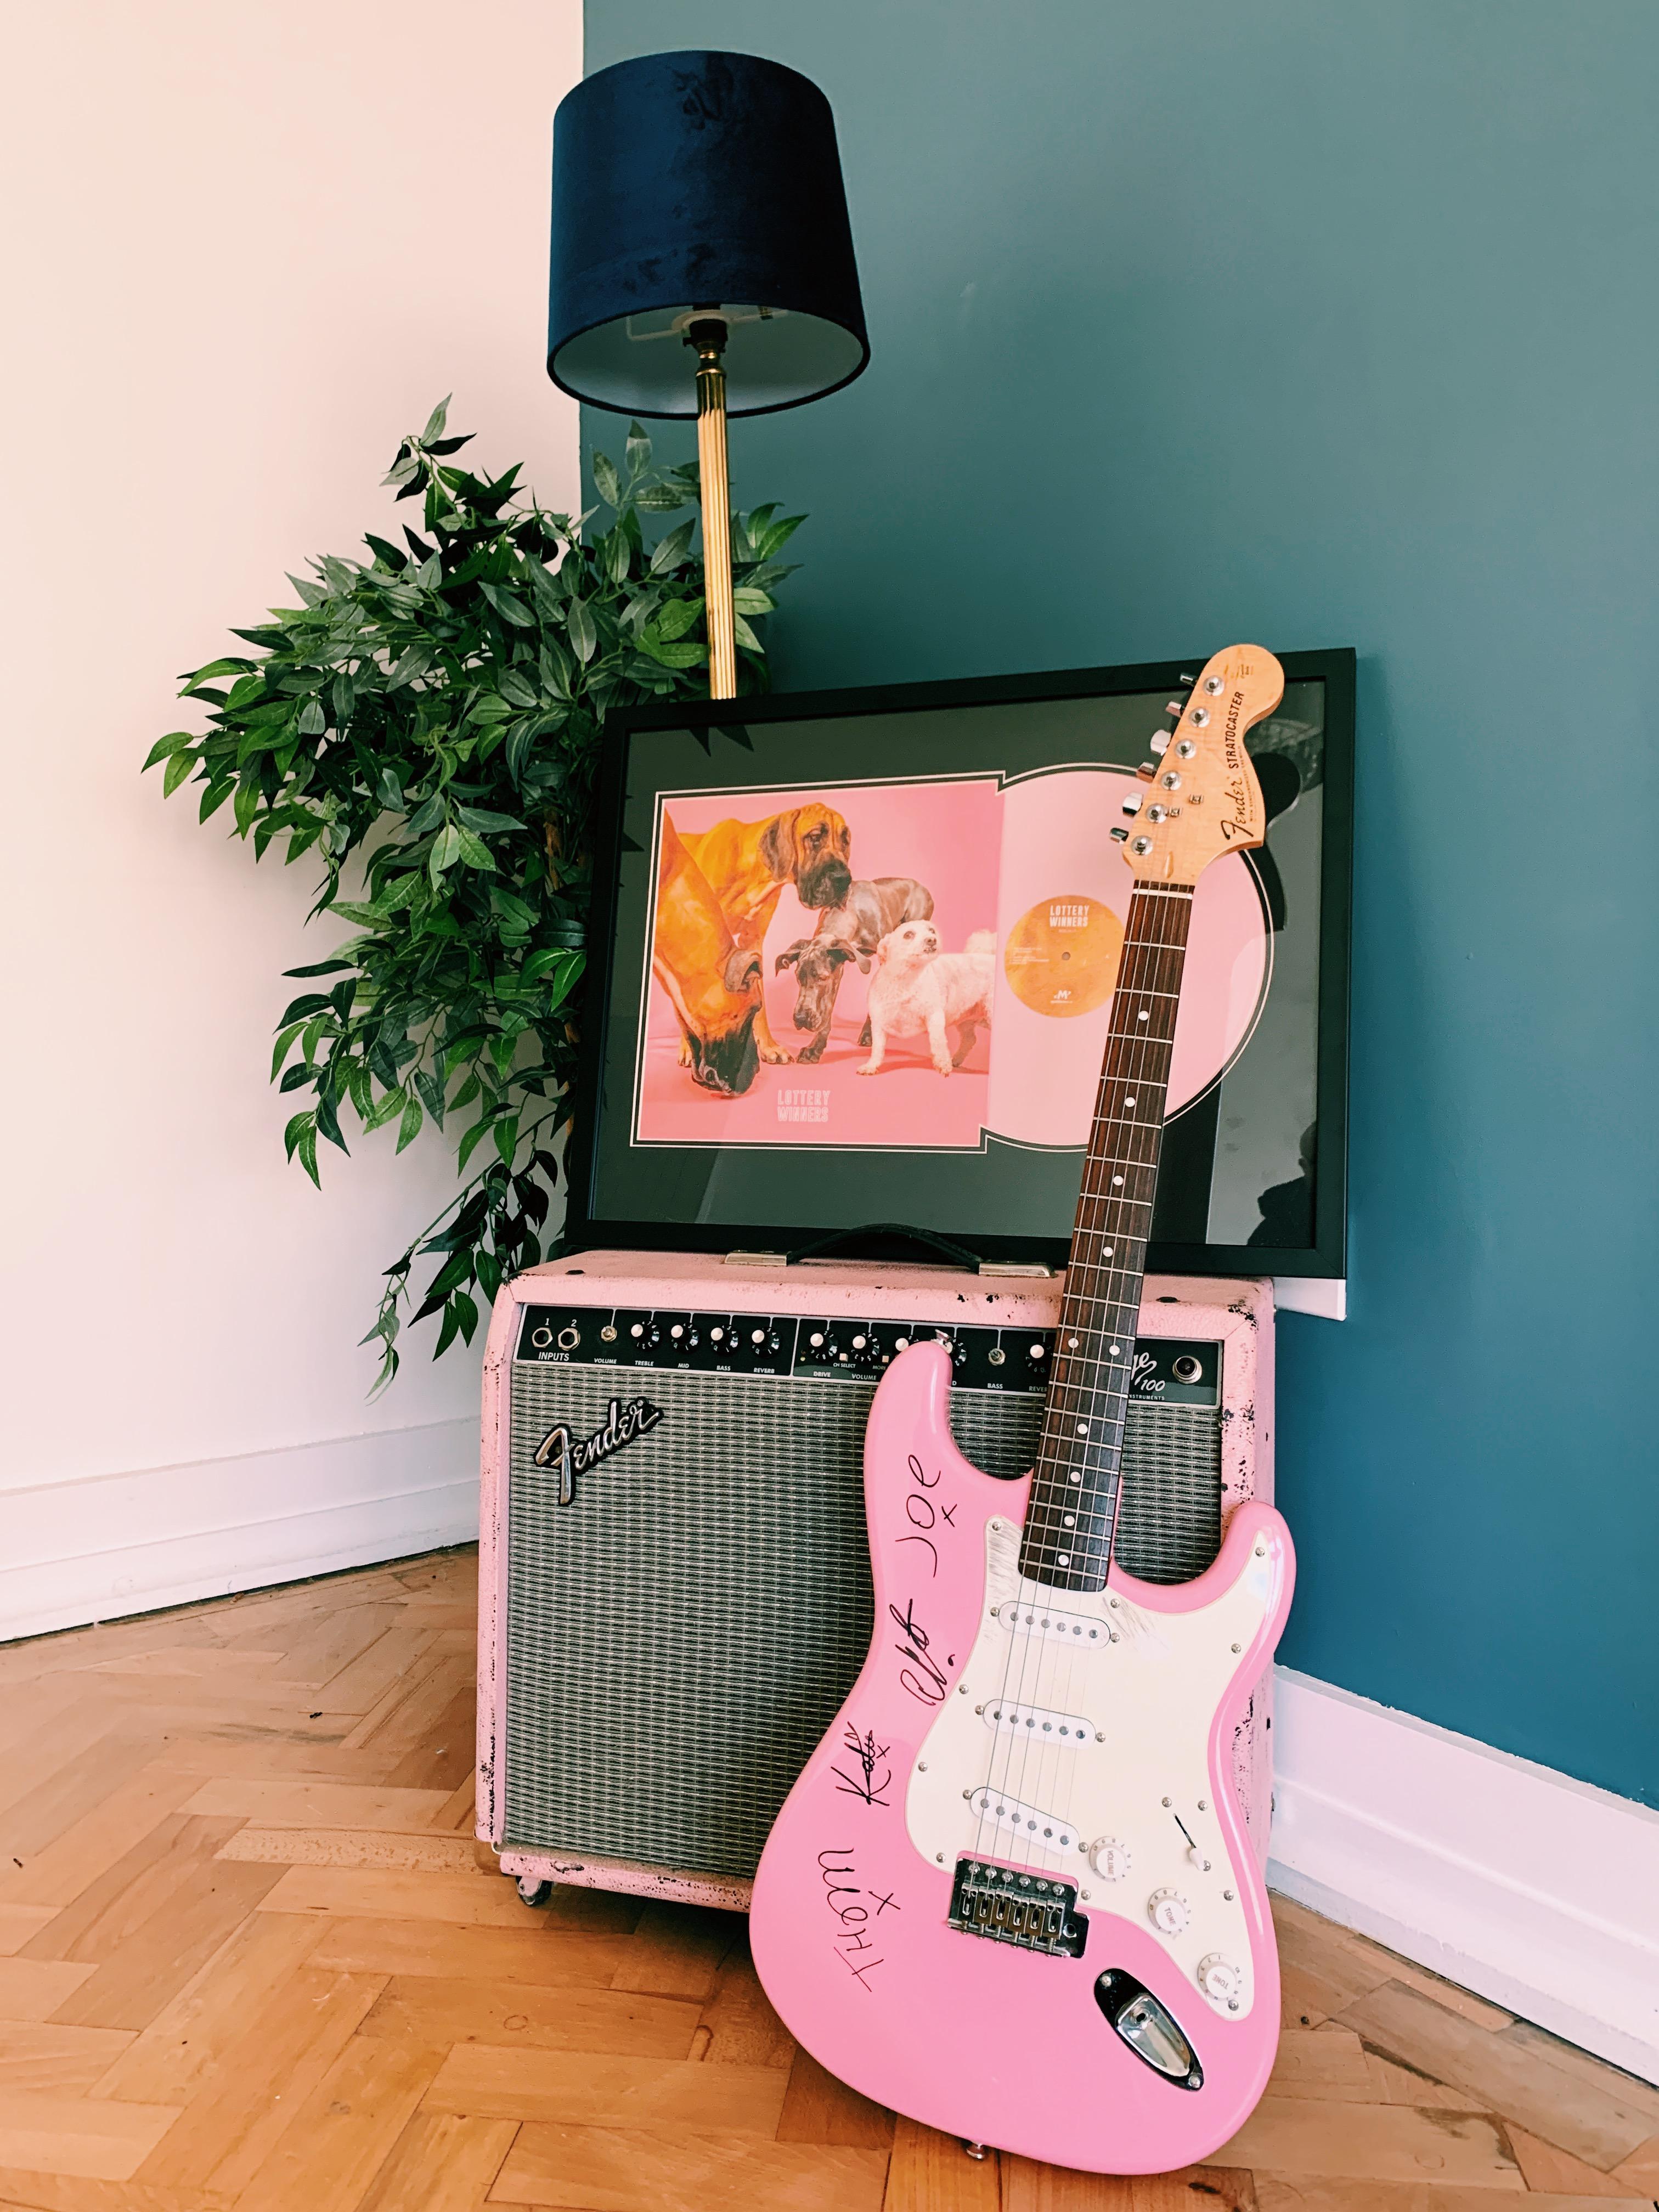 Win a Guitar